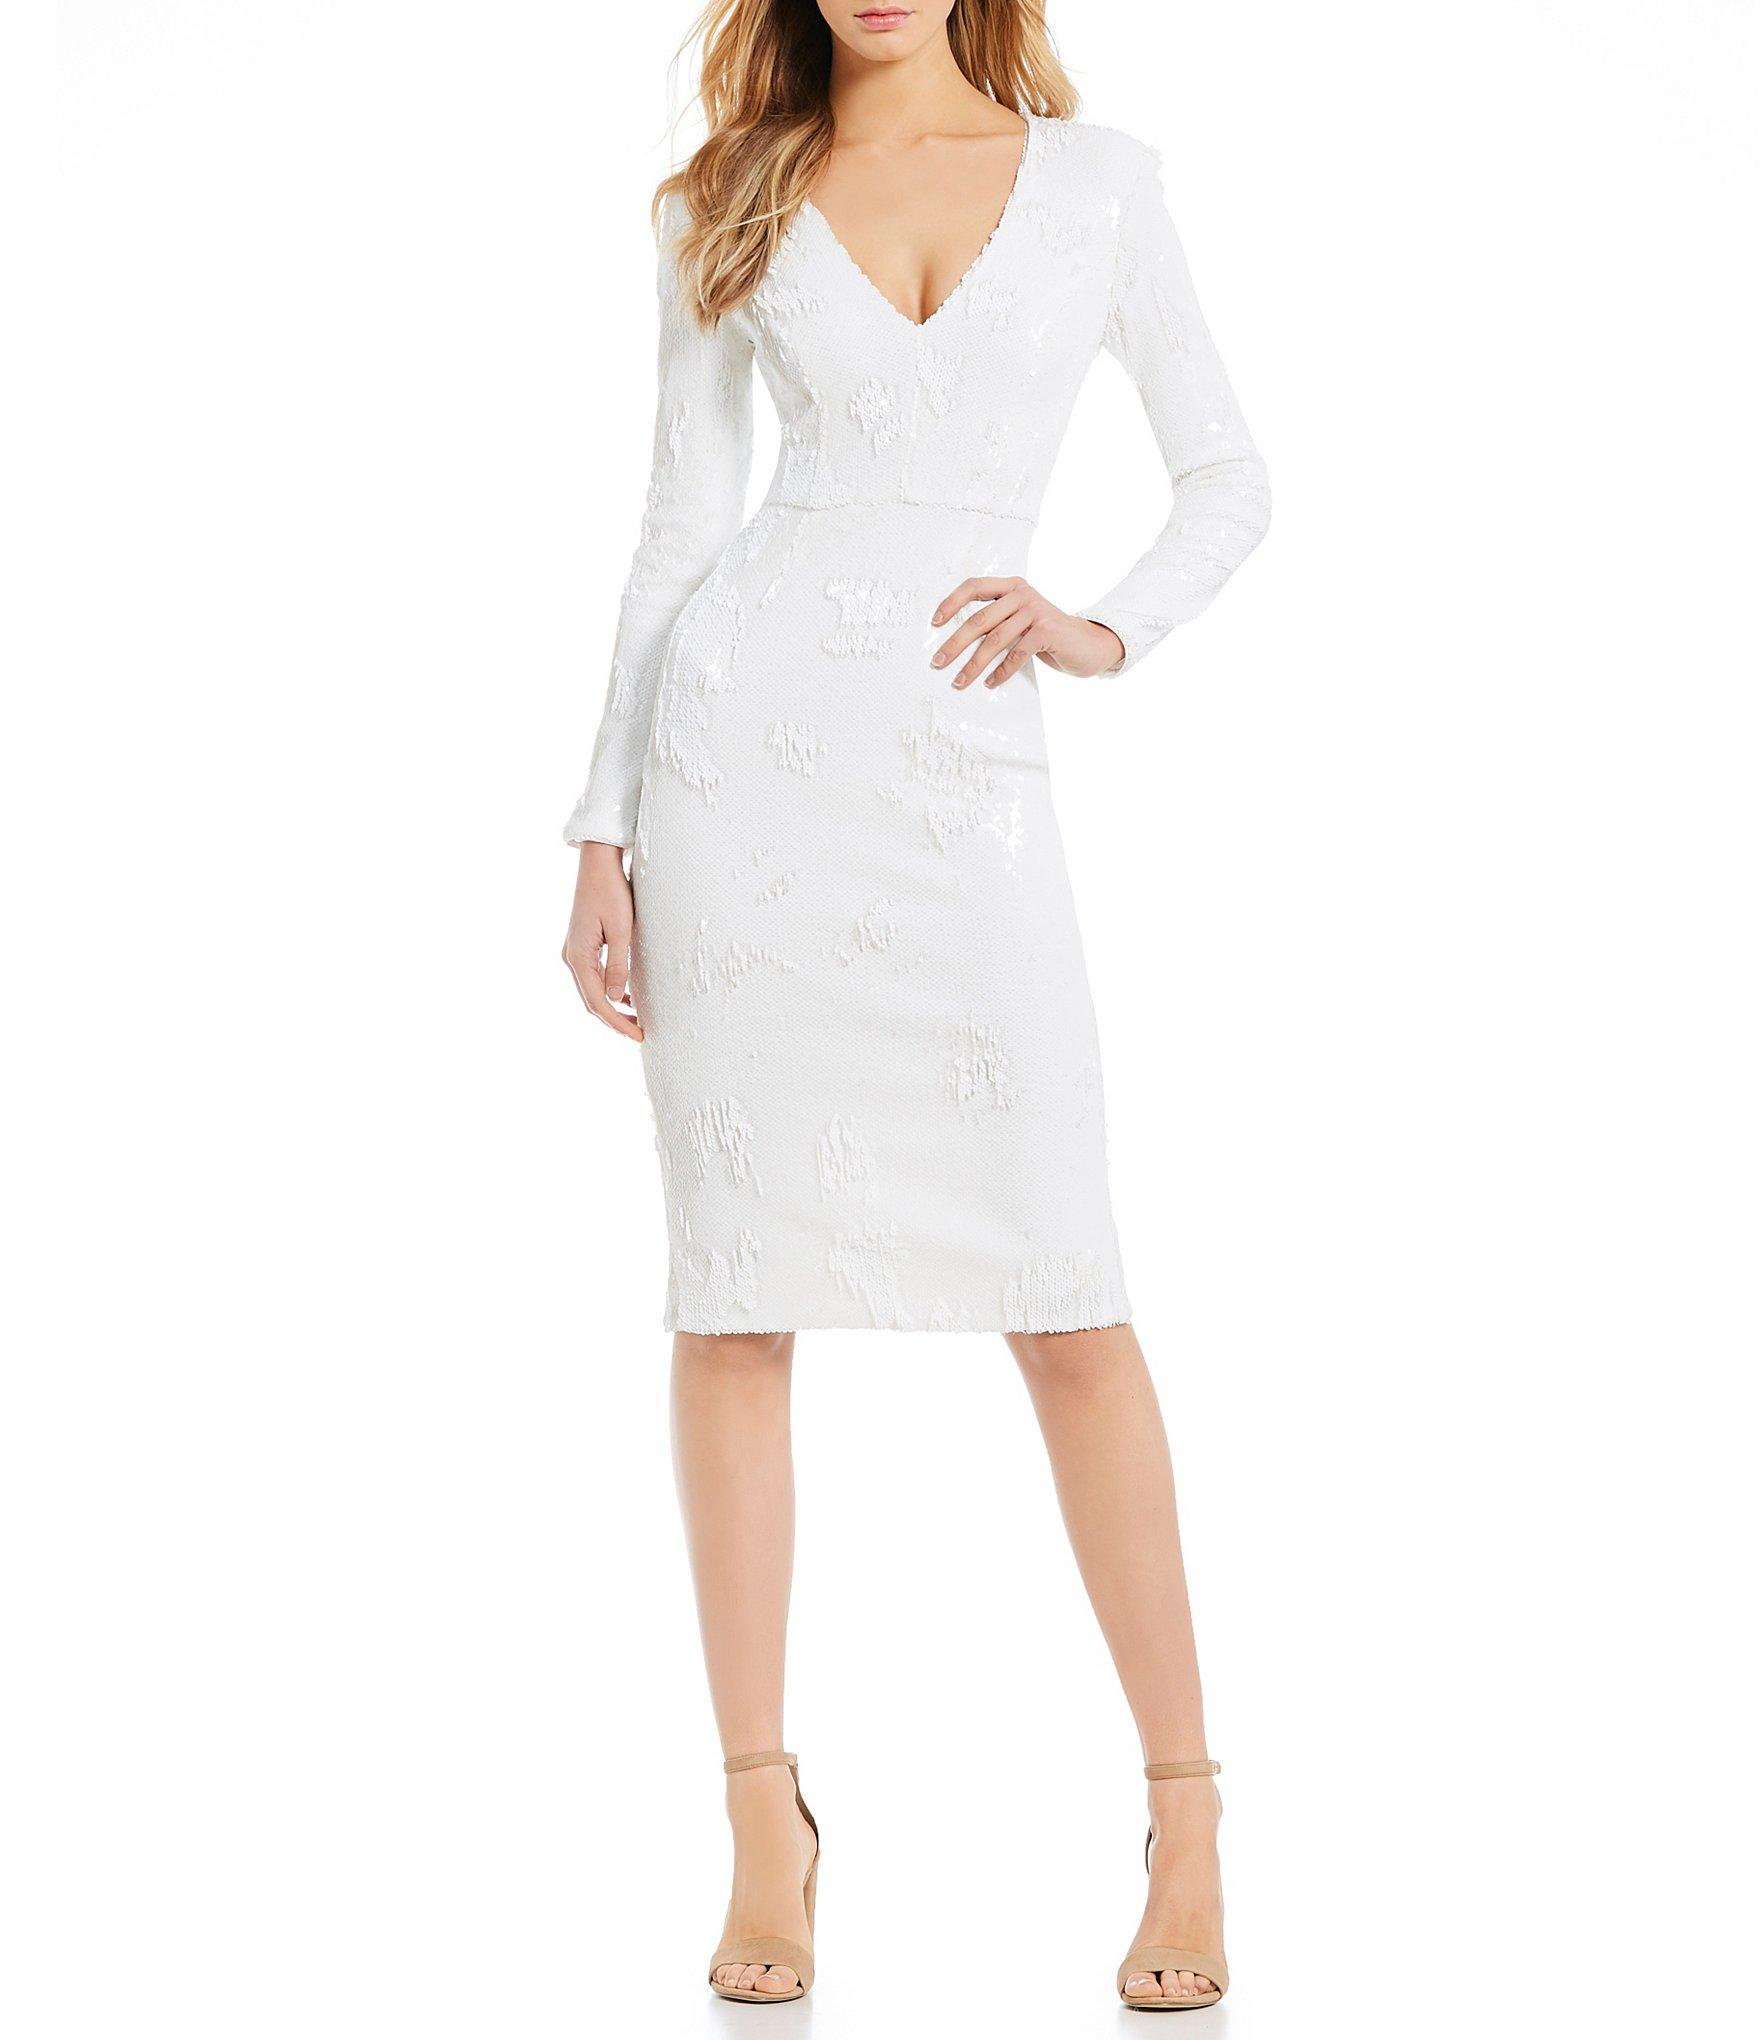 1a0e2723 Dress the Population Elizabeth Sequin Long Sleeve V-neck Midi Length ...